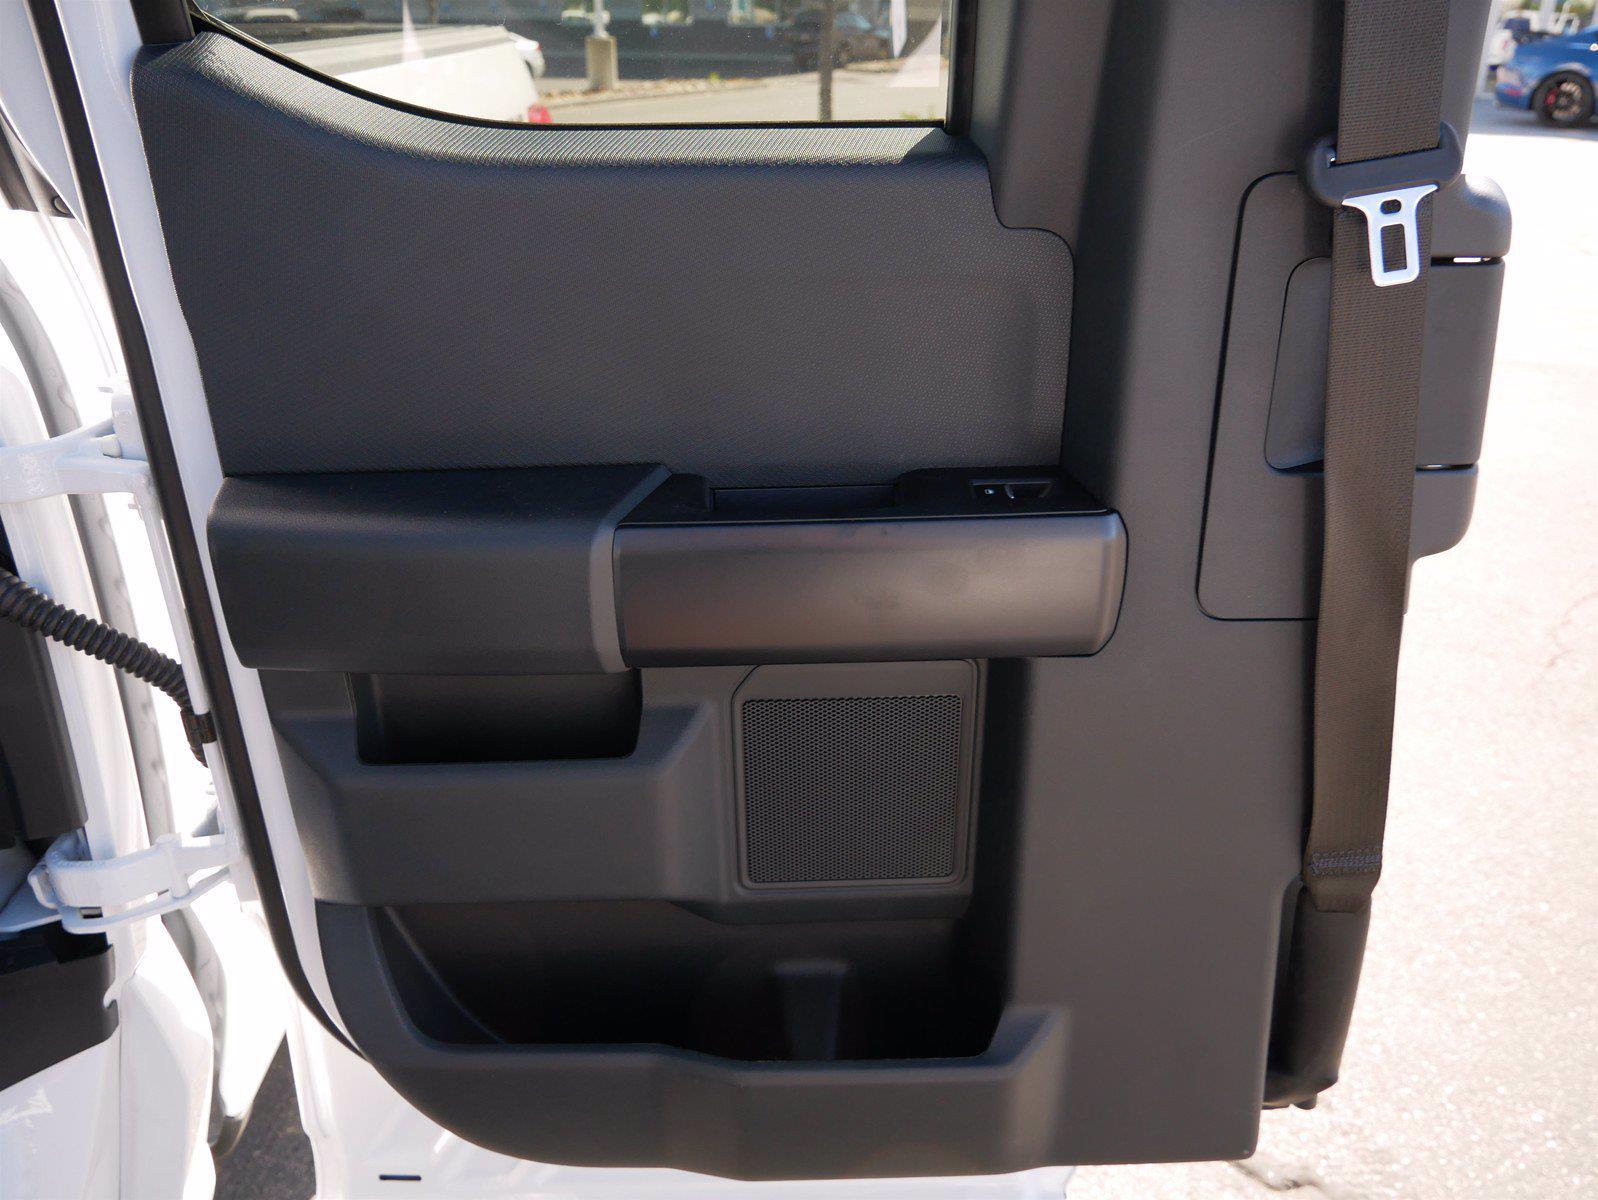 2021 Ford F-150 Super Cab 4x4, Pickup #64104 - photo 20